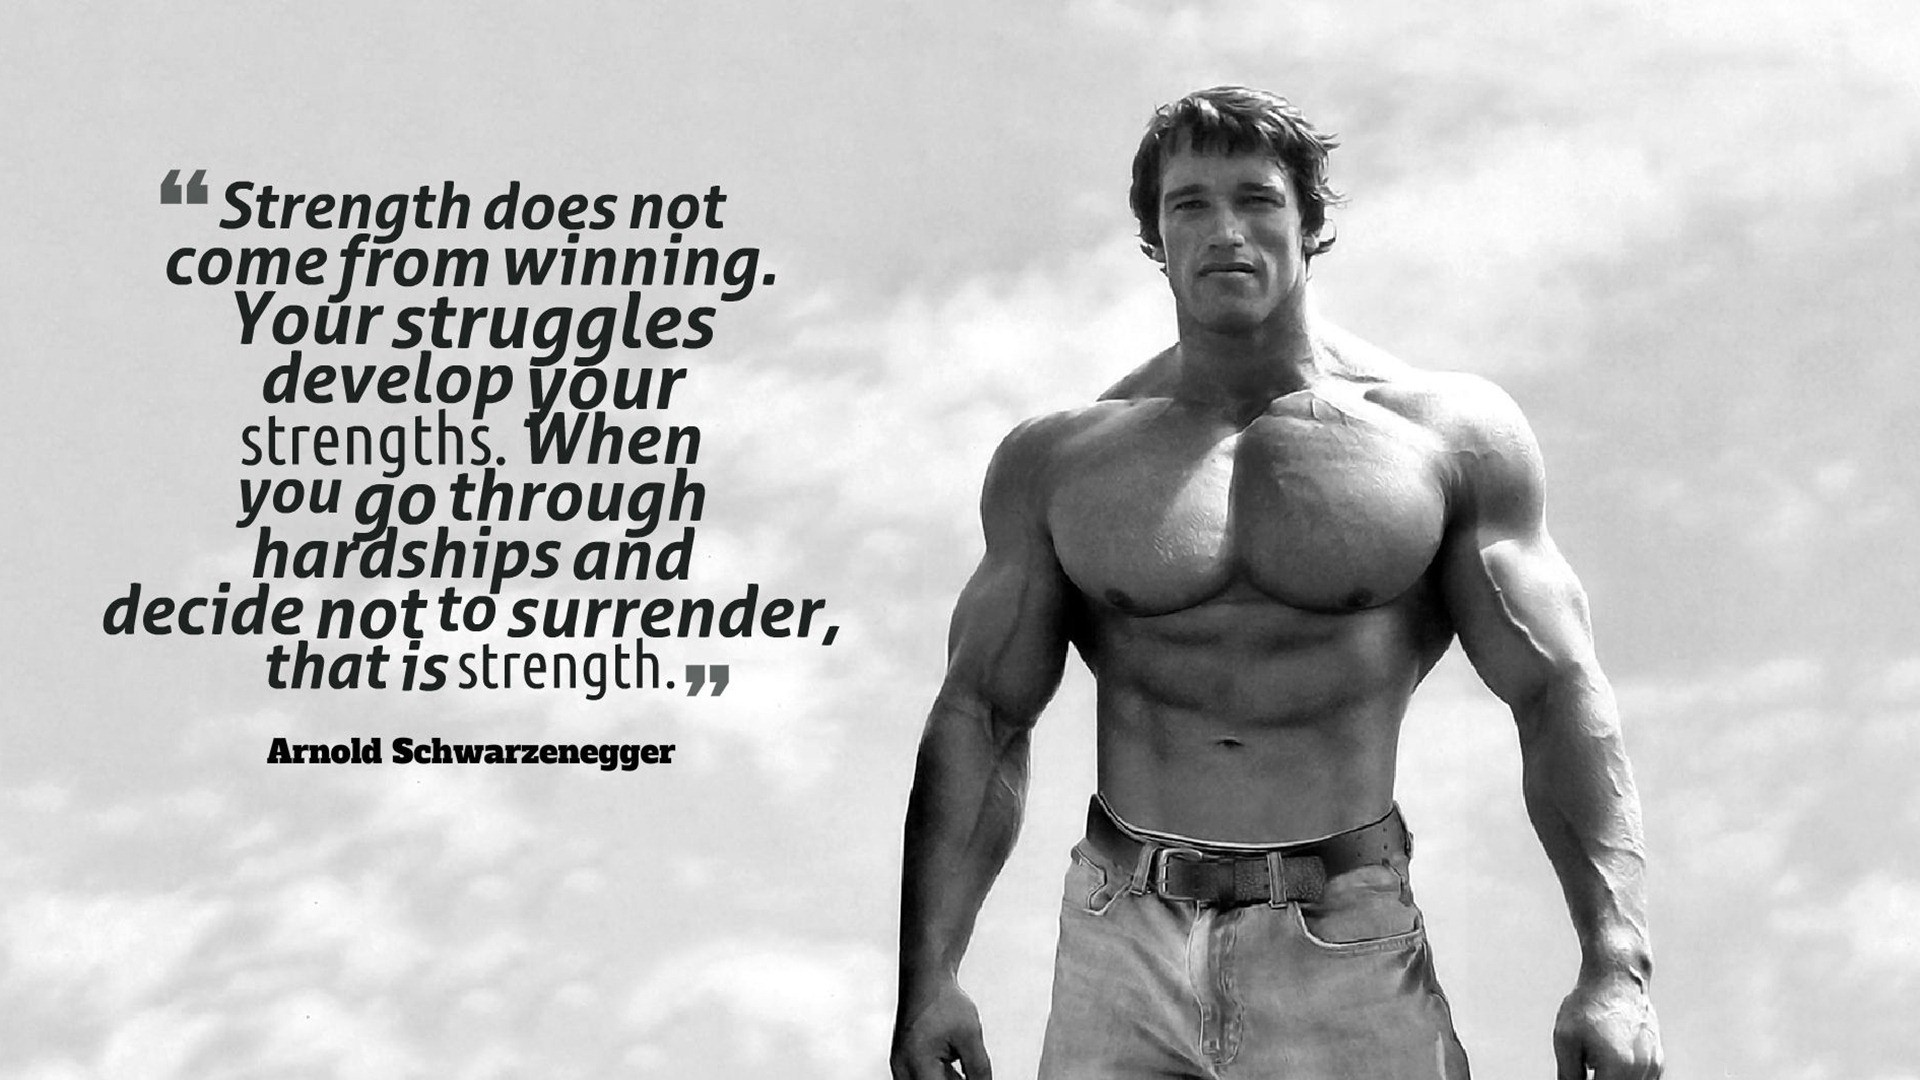 2pac Quote Iphone Wallpaper Arnold Schwarzenegger Strength Quotes Wallpaper 00193